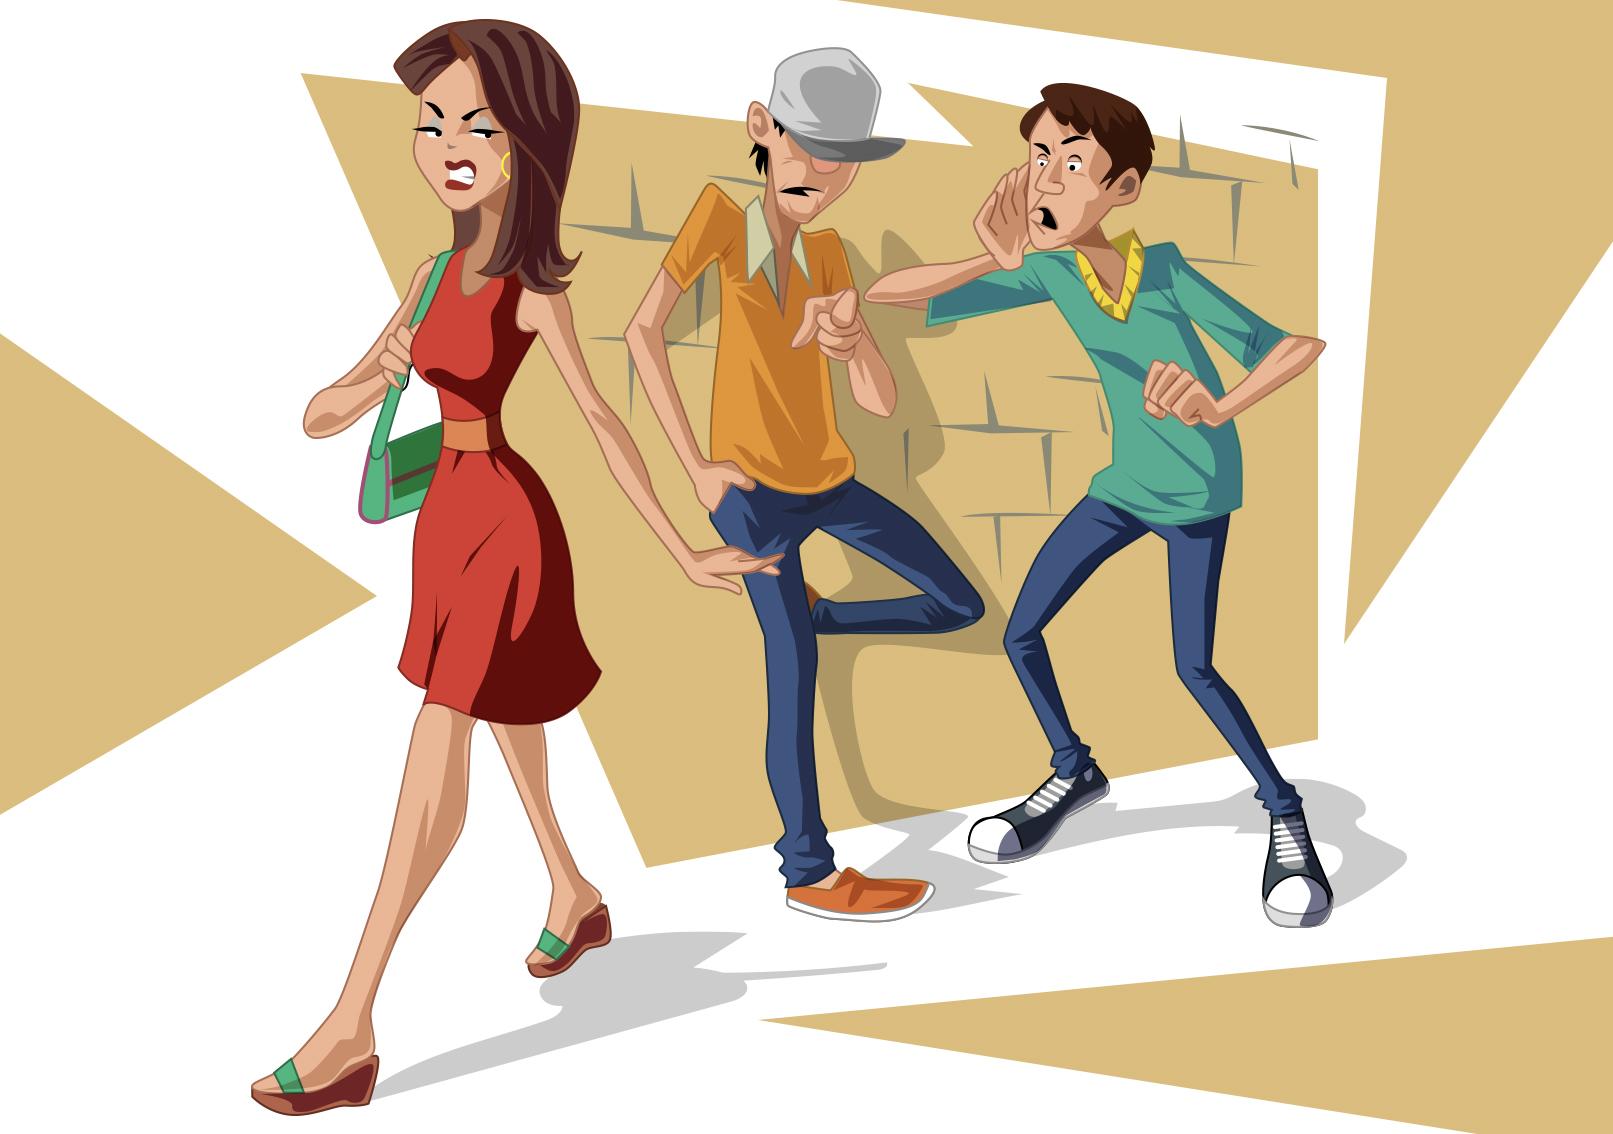 Urge IMMA castigar el acoso callejero